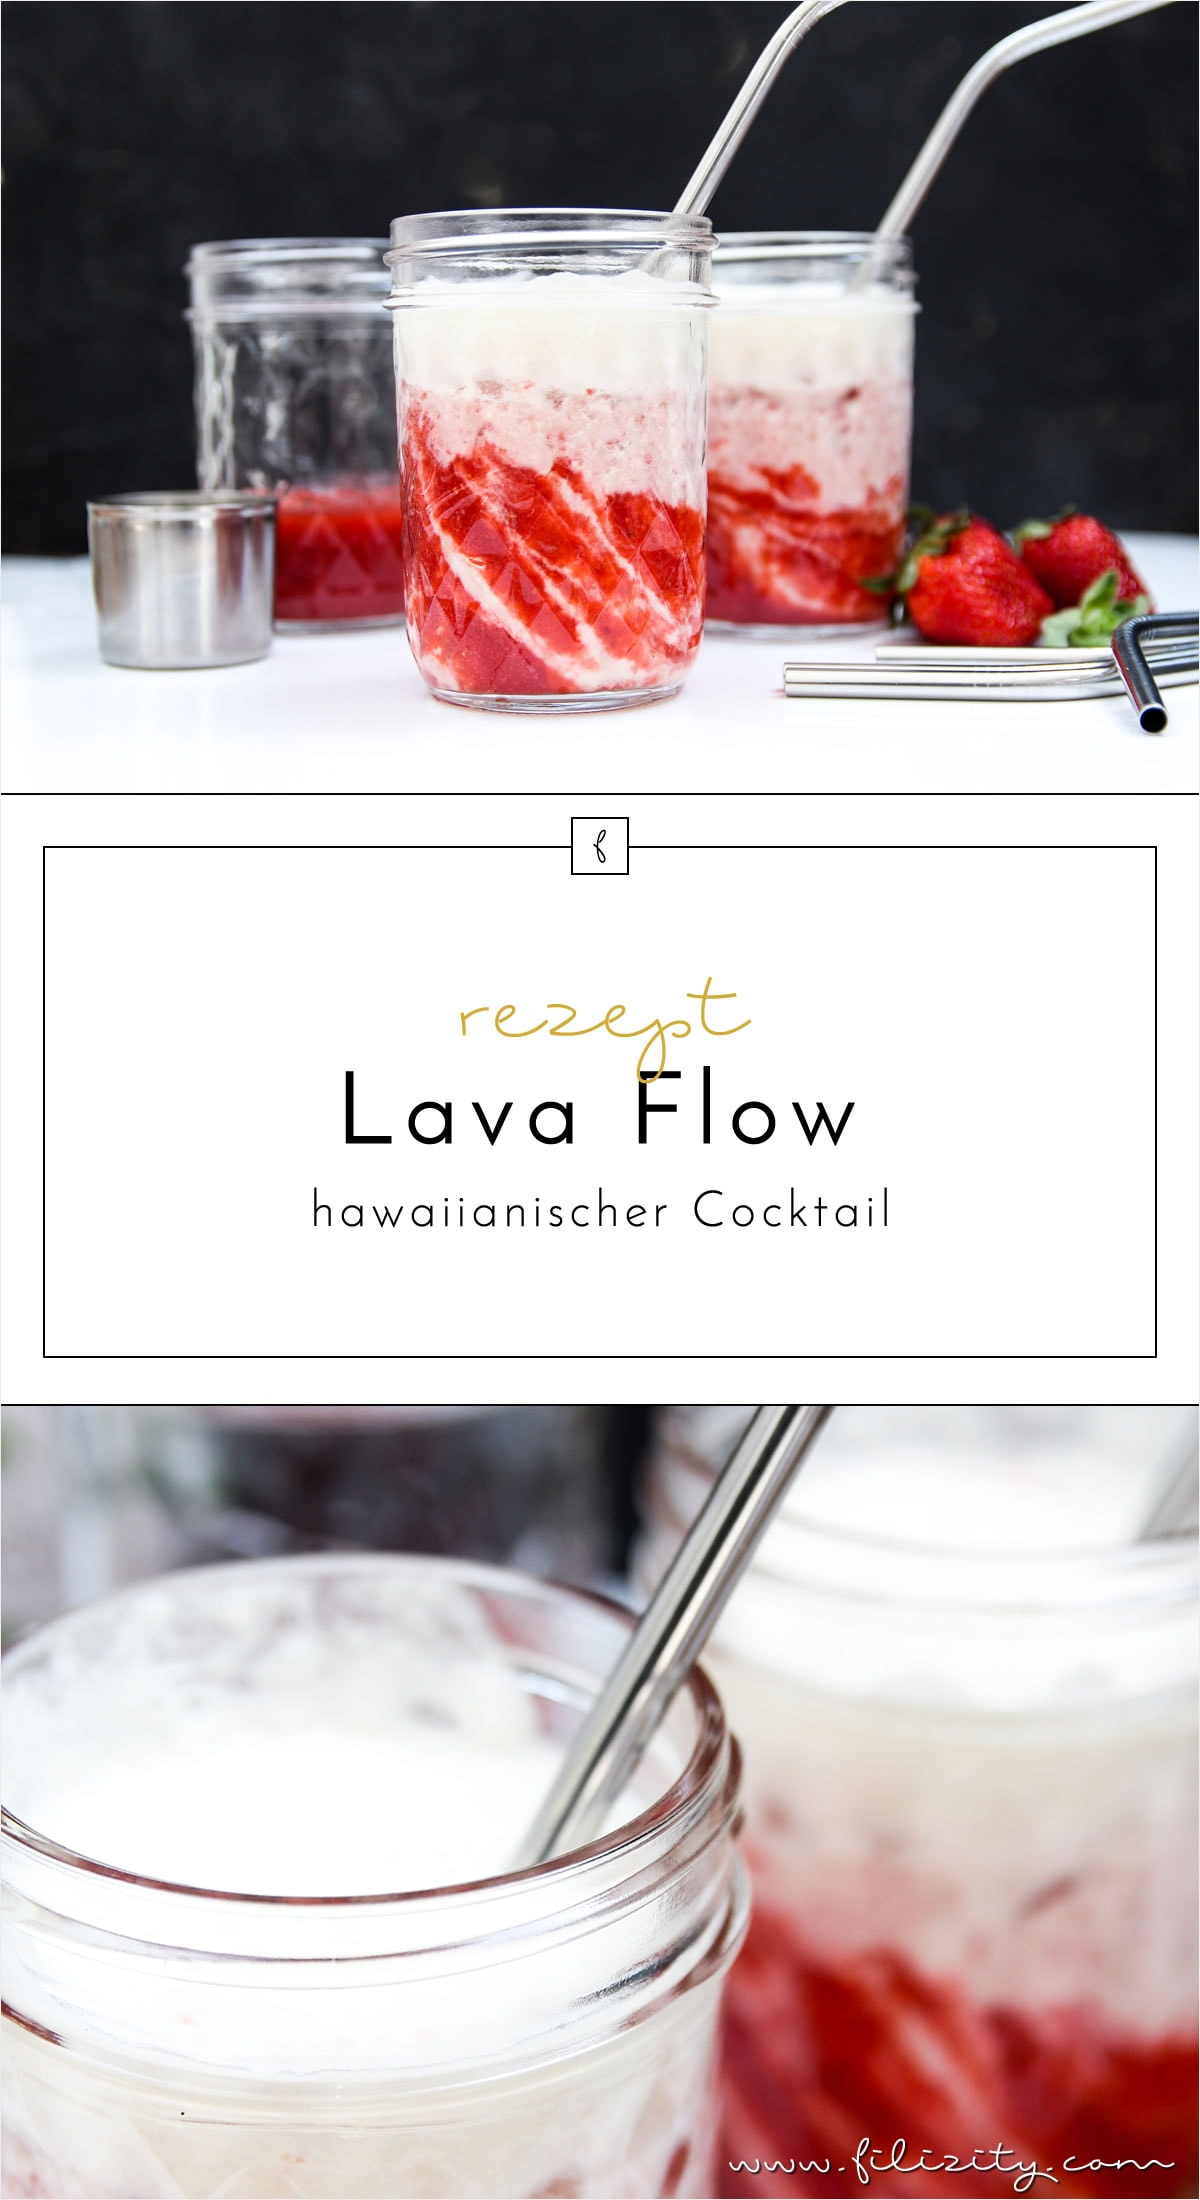 Lava Flow – hawaiianisches Cocktail-Rezept